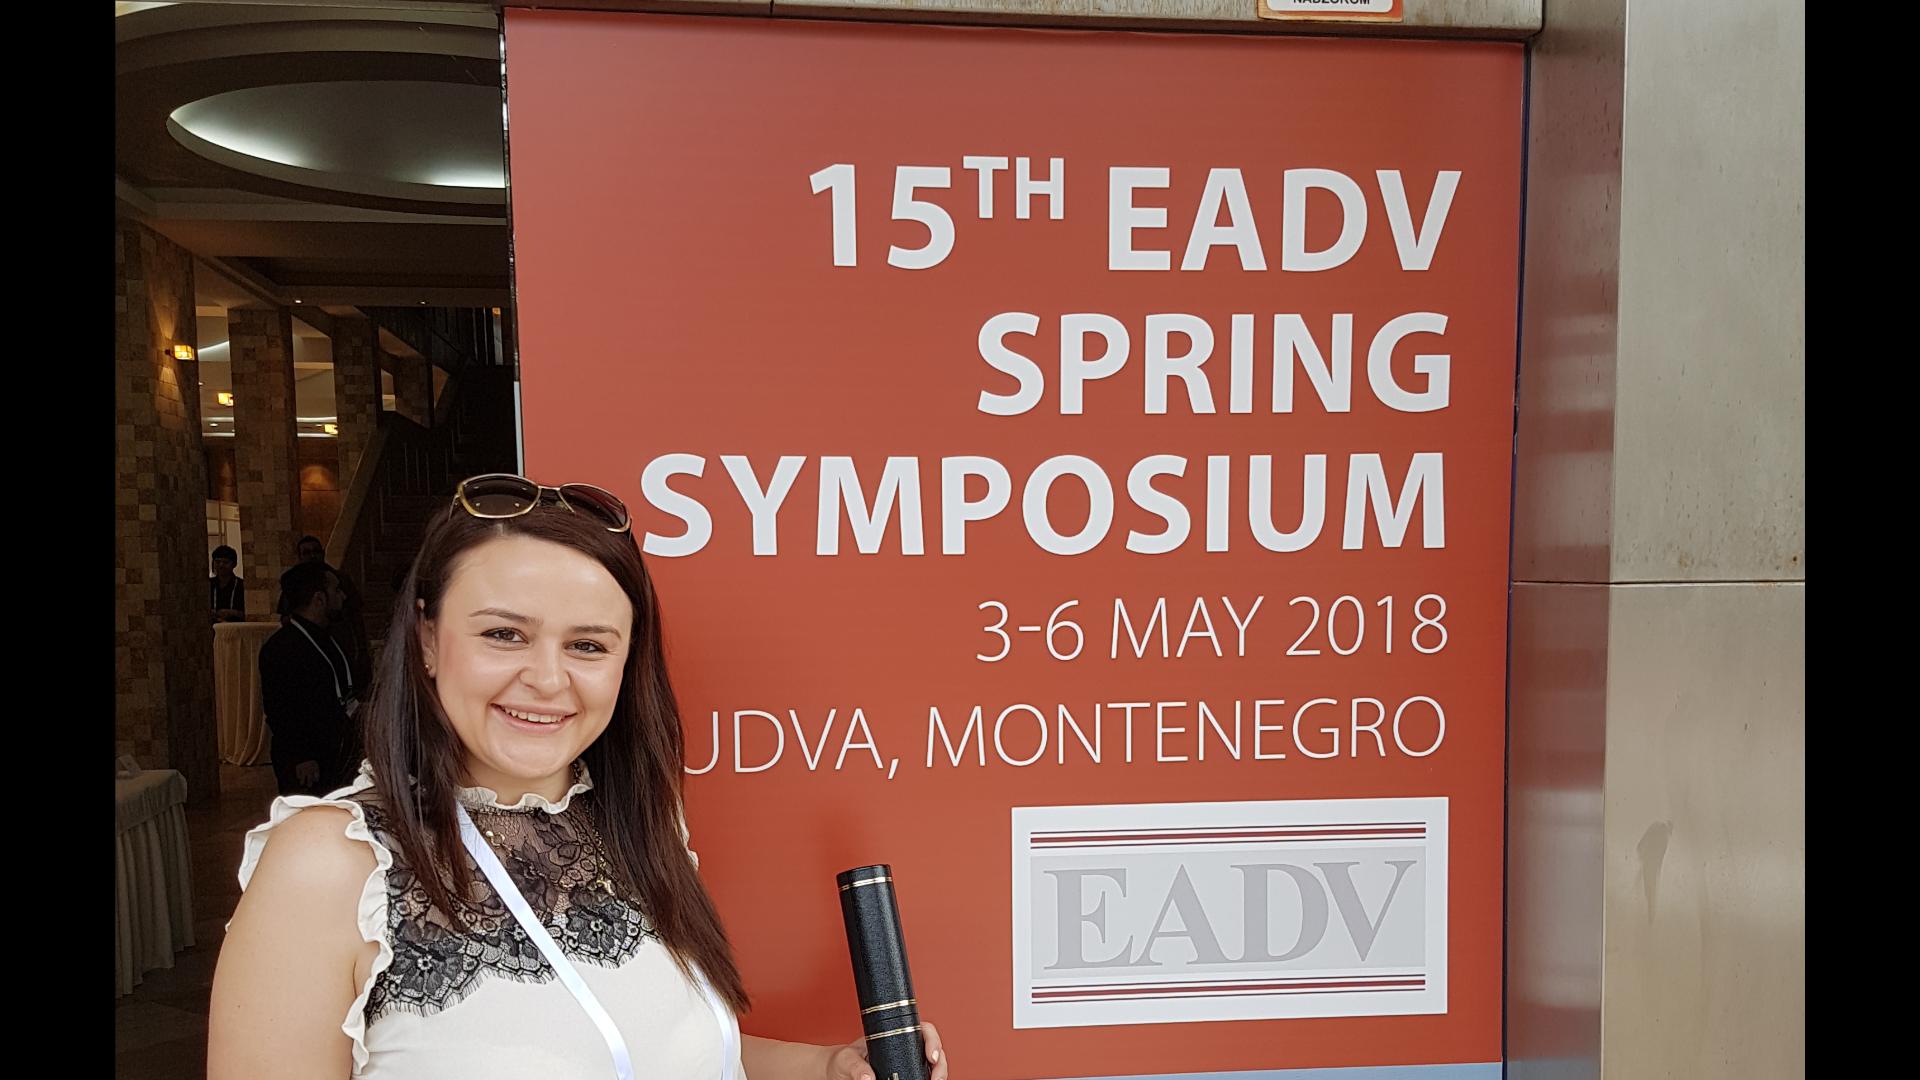 15th EADV Spring Symposium в Будва, Монтенегро